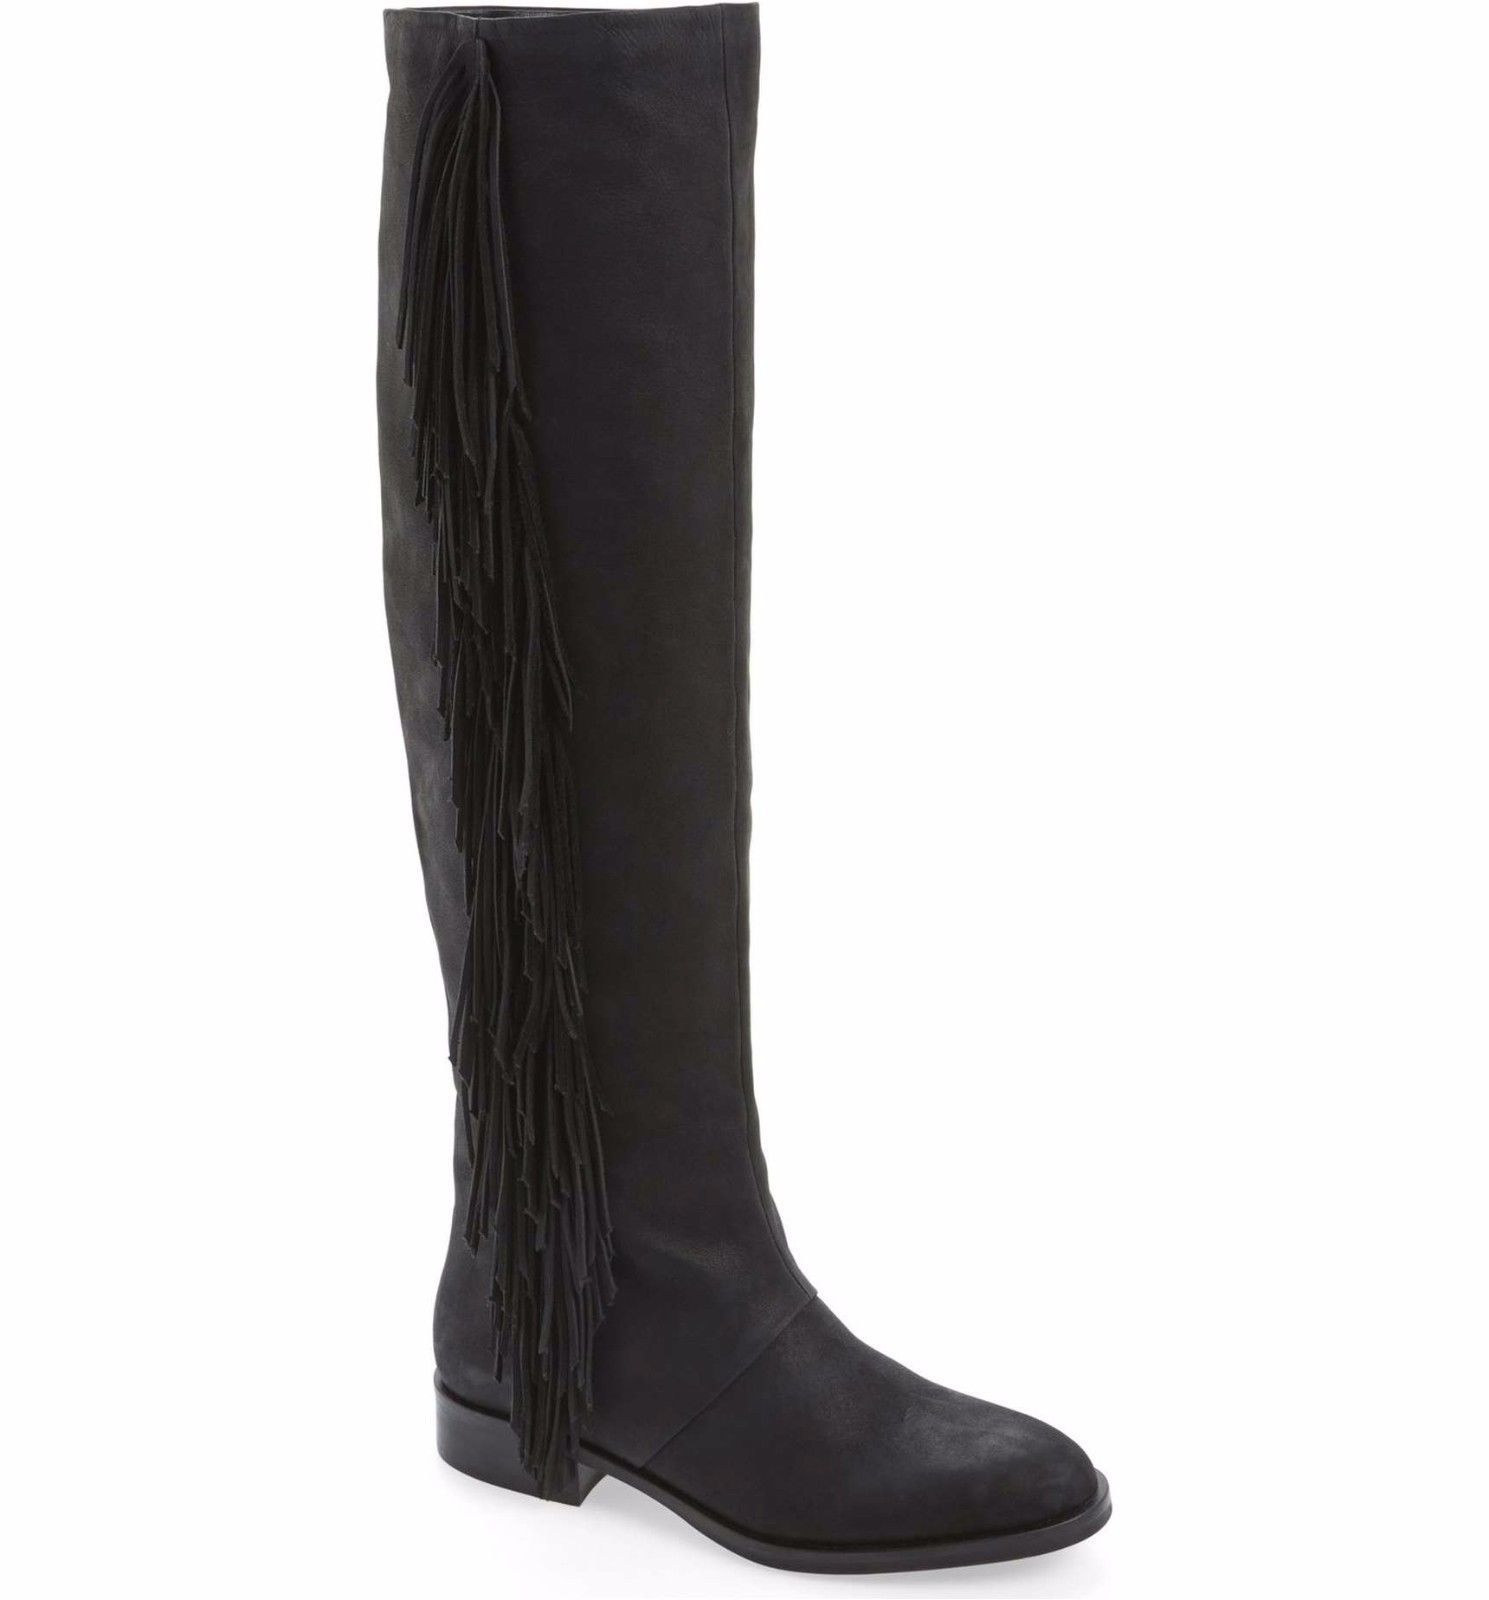 b3f7c64bfb76  275 SAM EDELMAN New Josephine Tall Fringe Leather Riding Boots Black Size  5 -  102.82